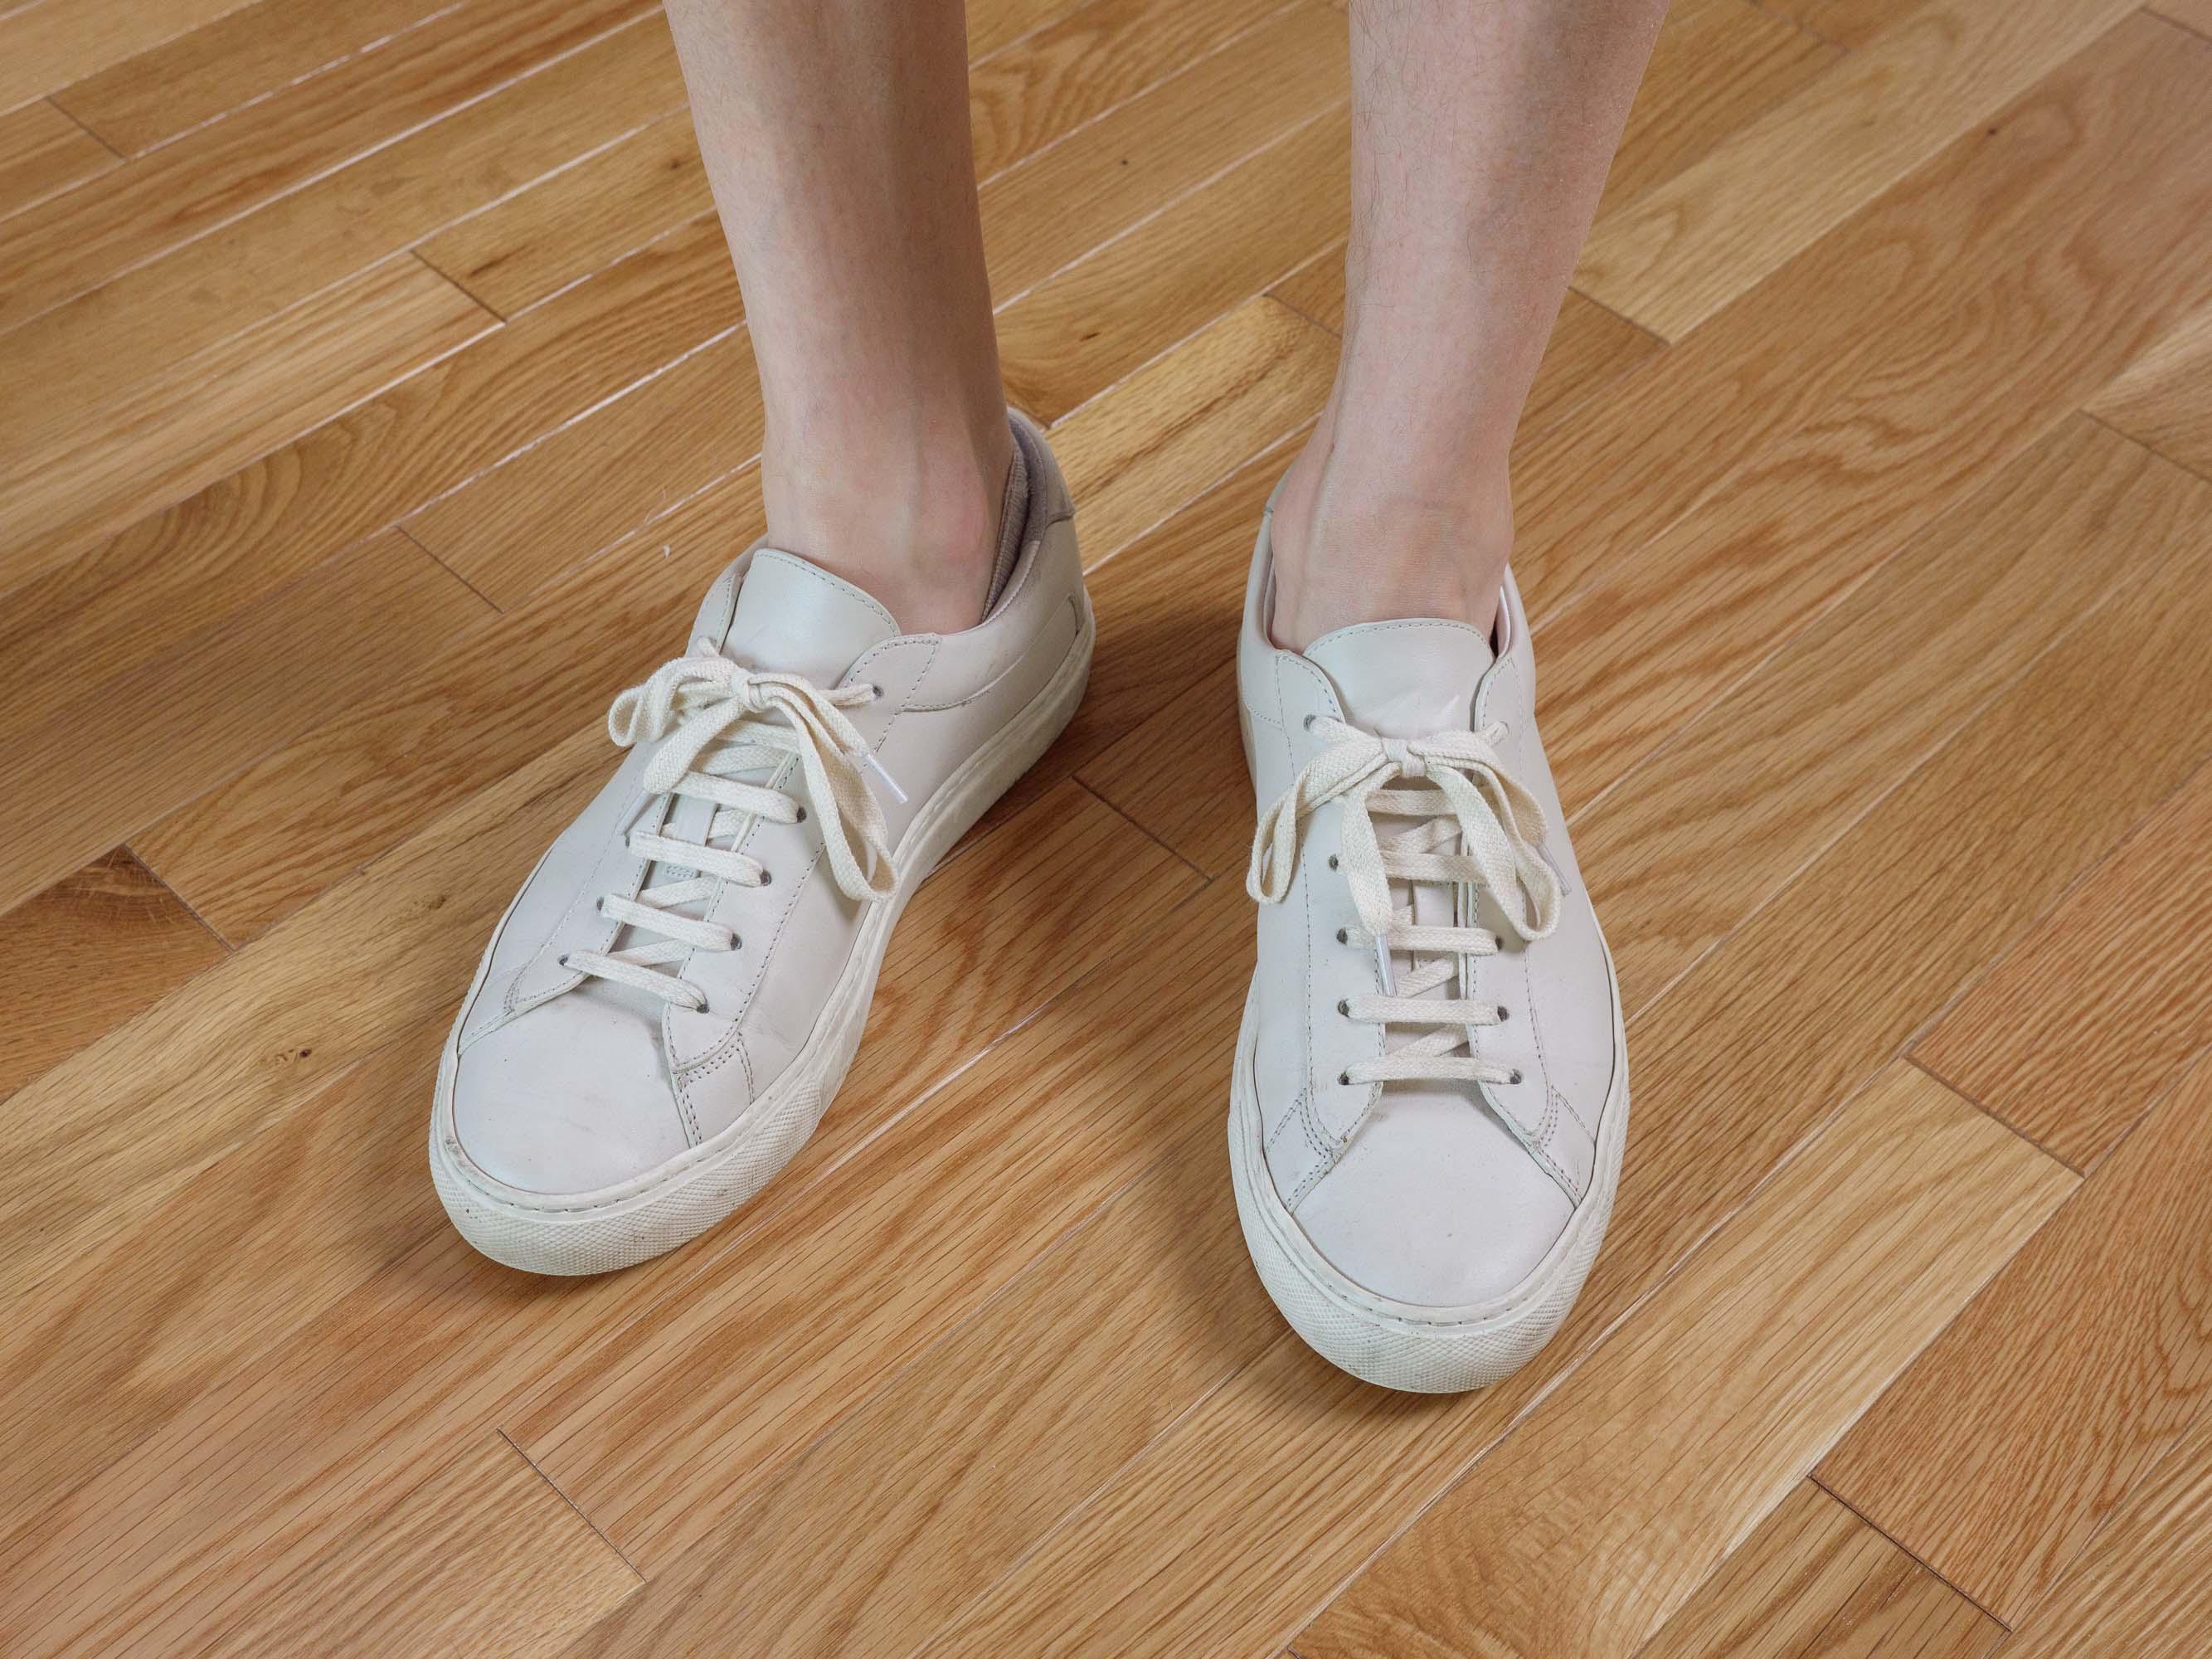 Boardroom Socks no show sneakers